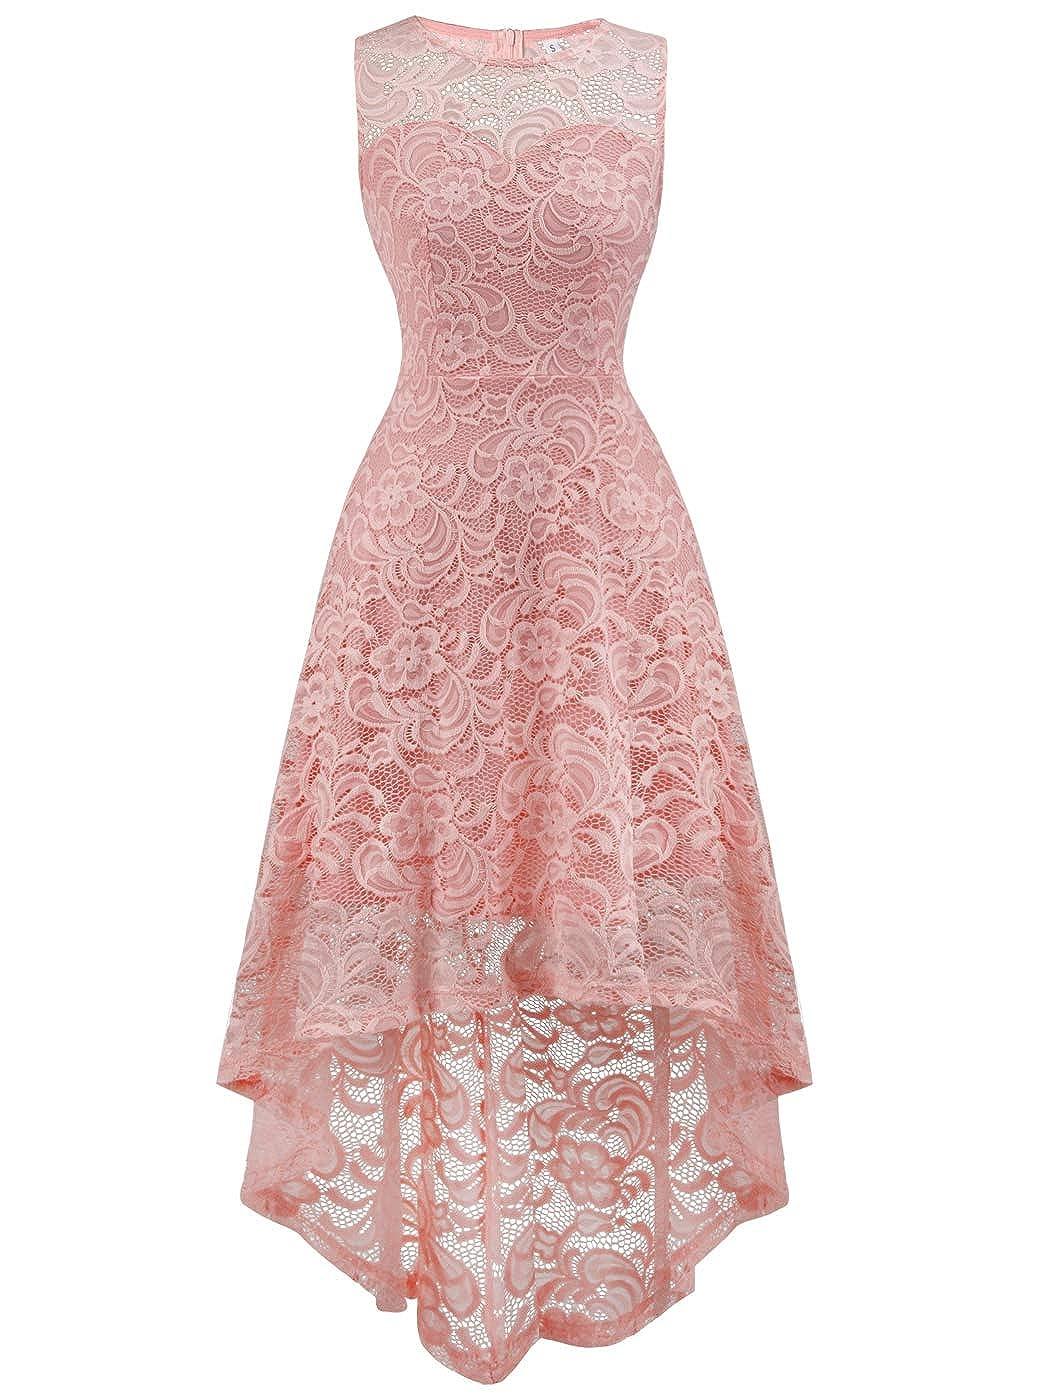 FAIRY COUPLE Womens Halter Hi-Lo Floral Lace Cocktail Party Bridesmaid Dress